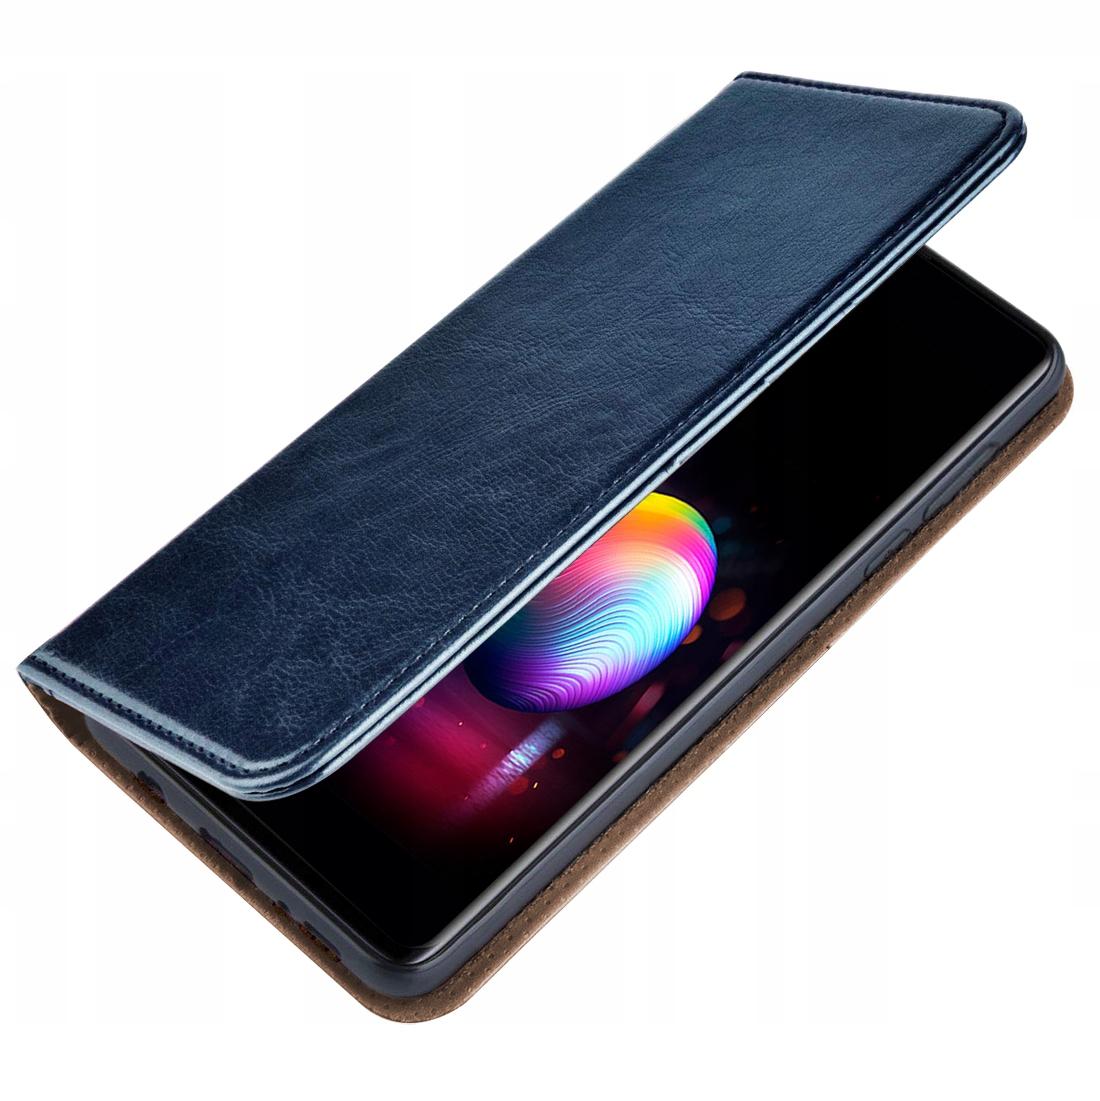 Etui do Samsung Galaxy A42 5G Skórzane Case +Szkło Dedykowany model Samsung Galaxy A42 5G